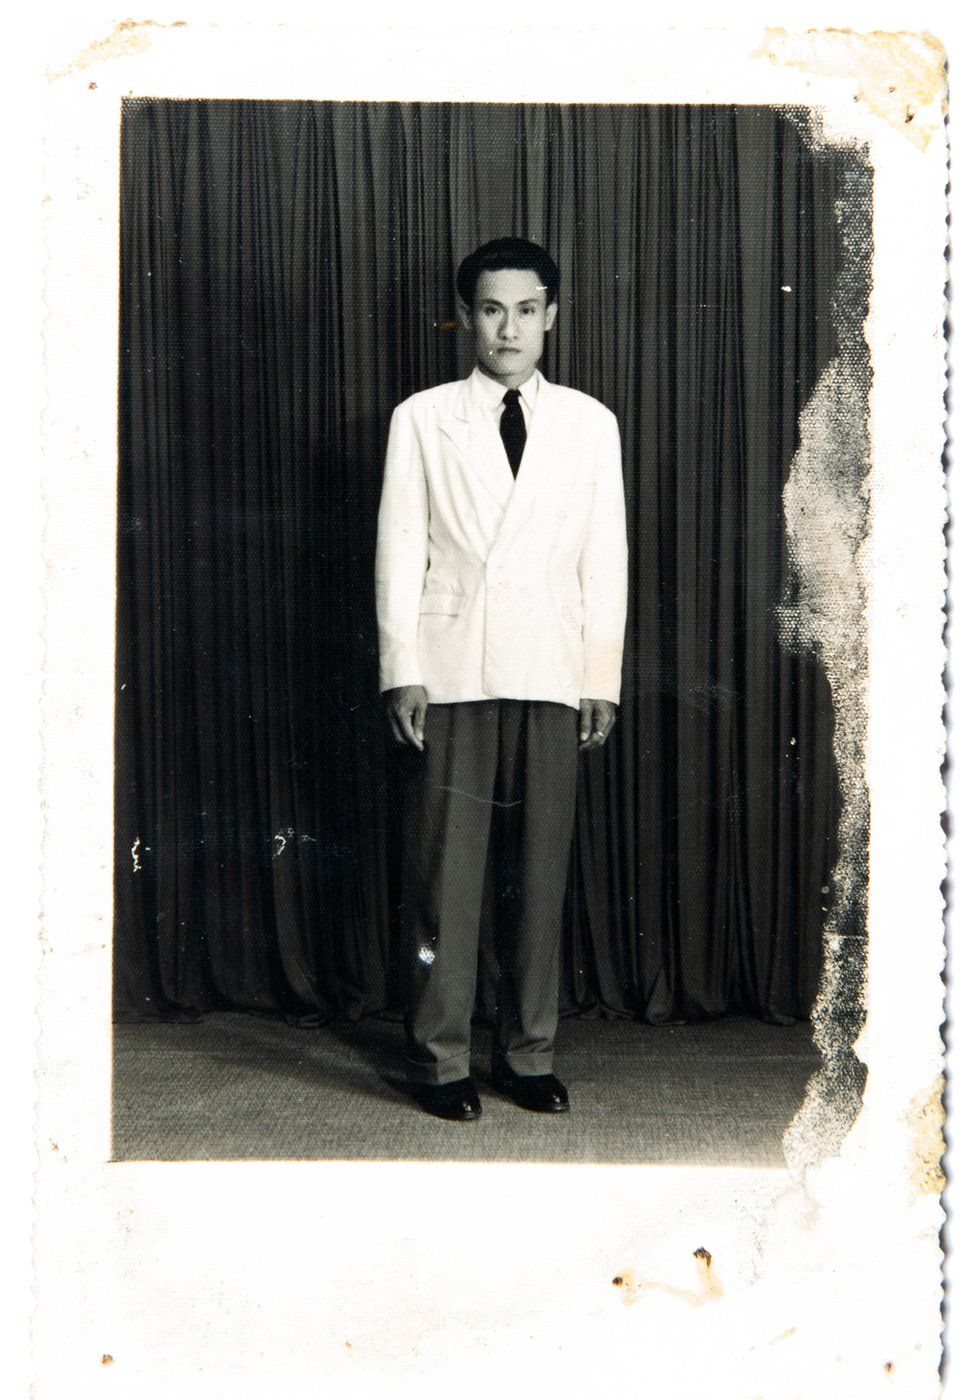 Vira's maternal grandfather